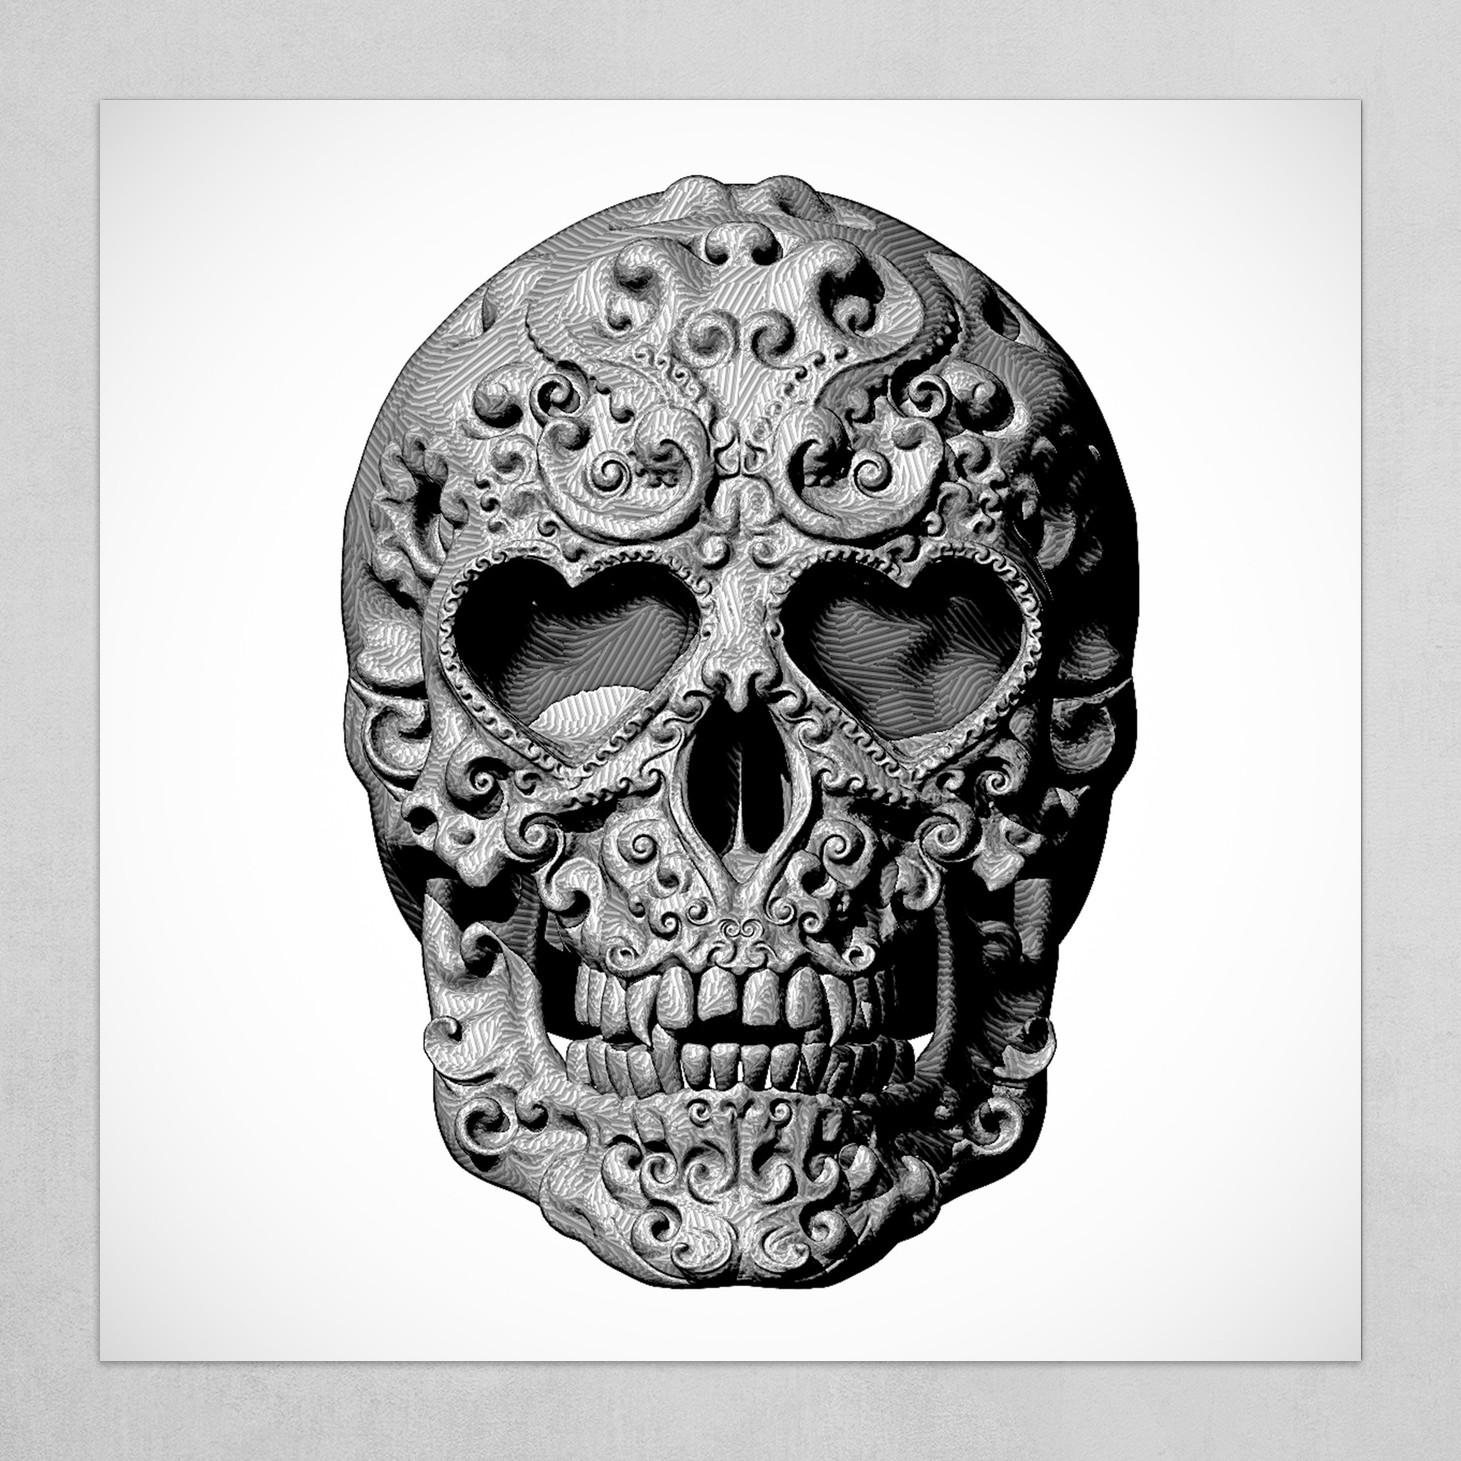 Mexican Skull Calavera Day of the dead themed - no signature